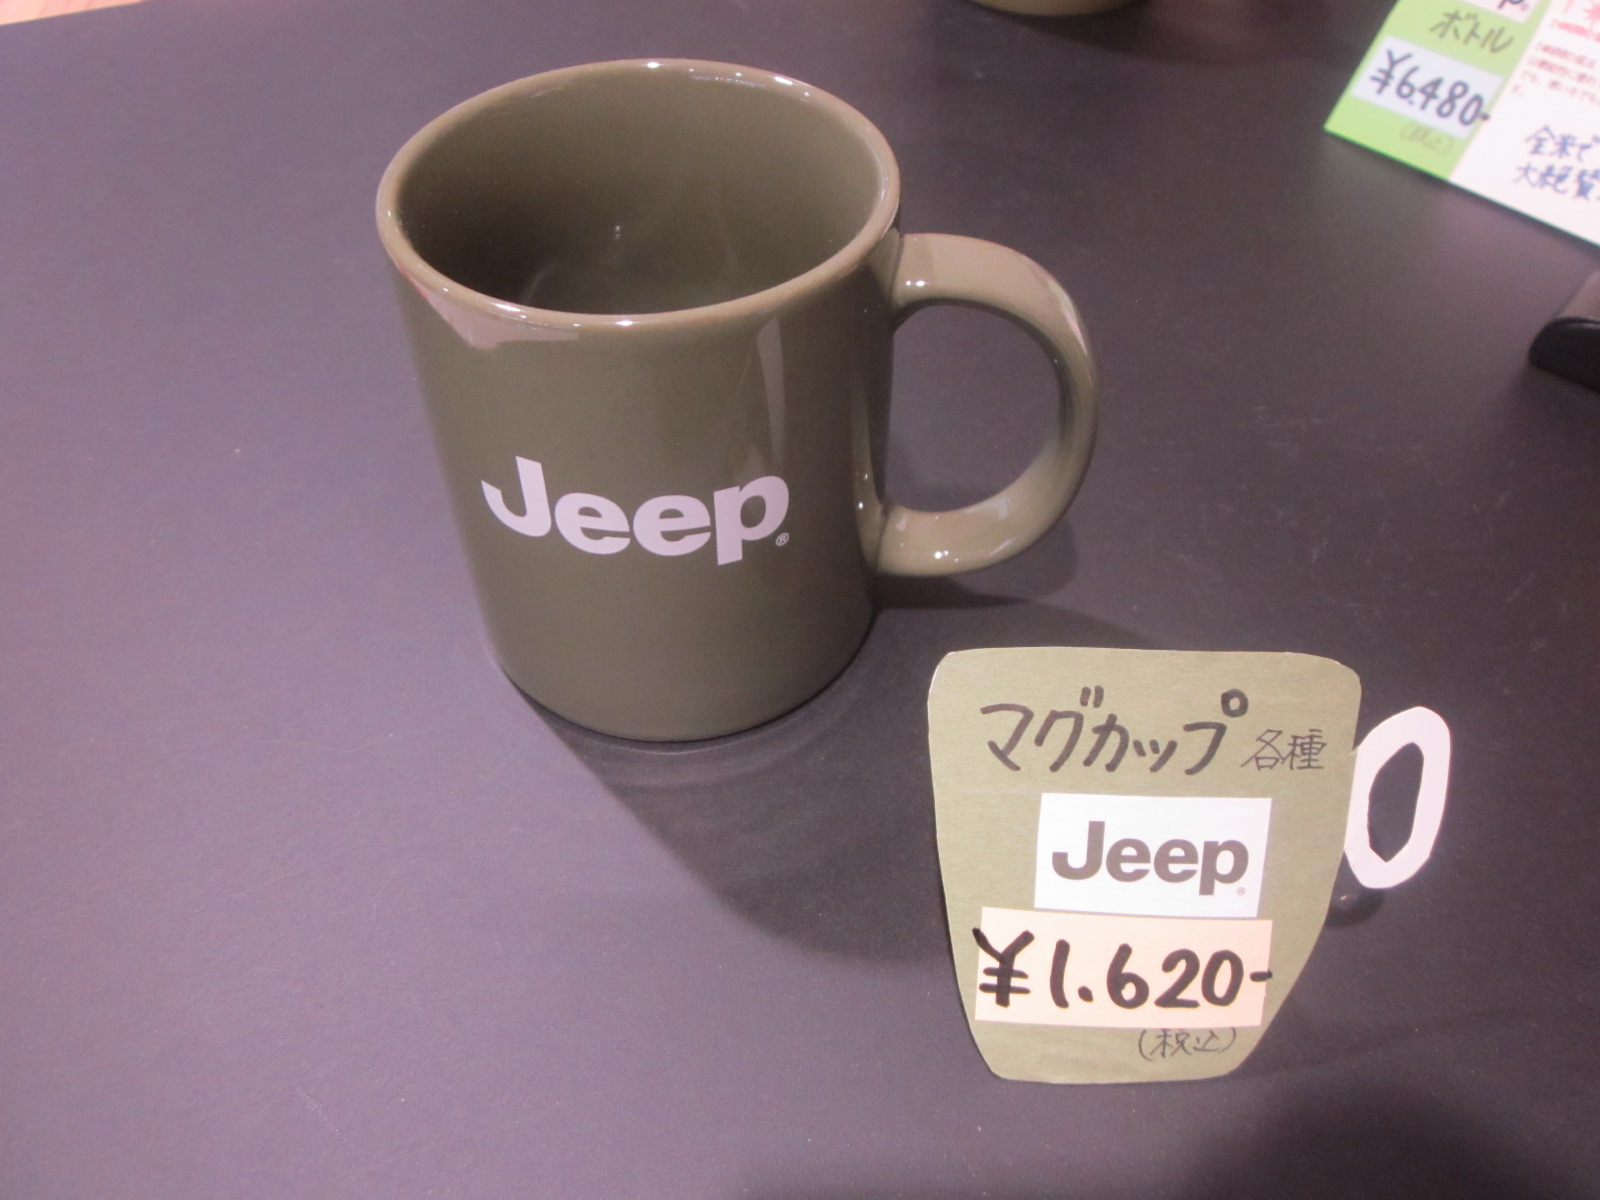 Jeep マグカップ 001